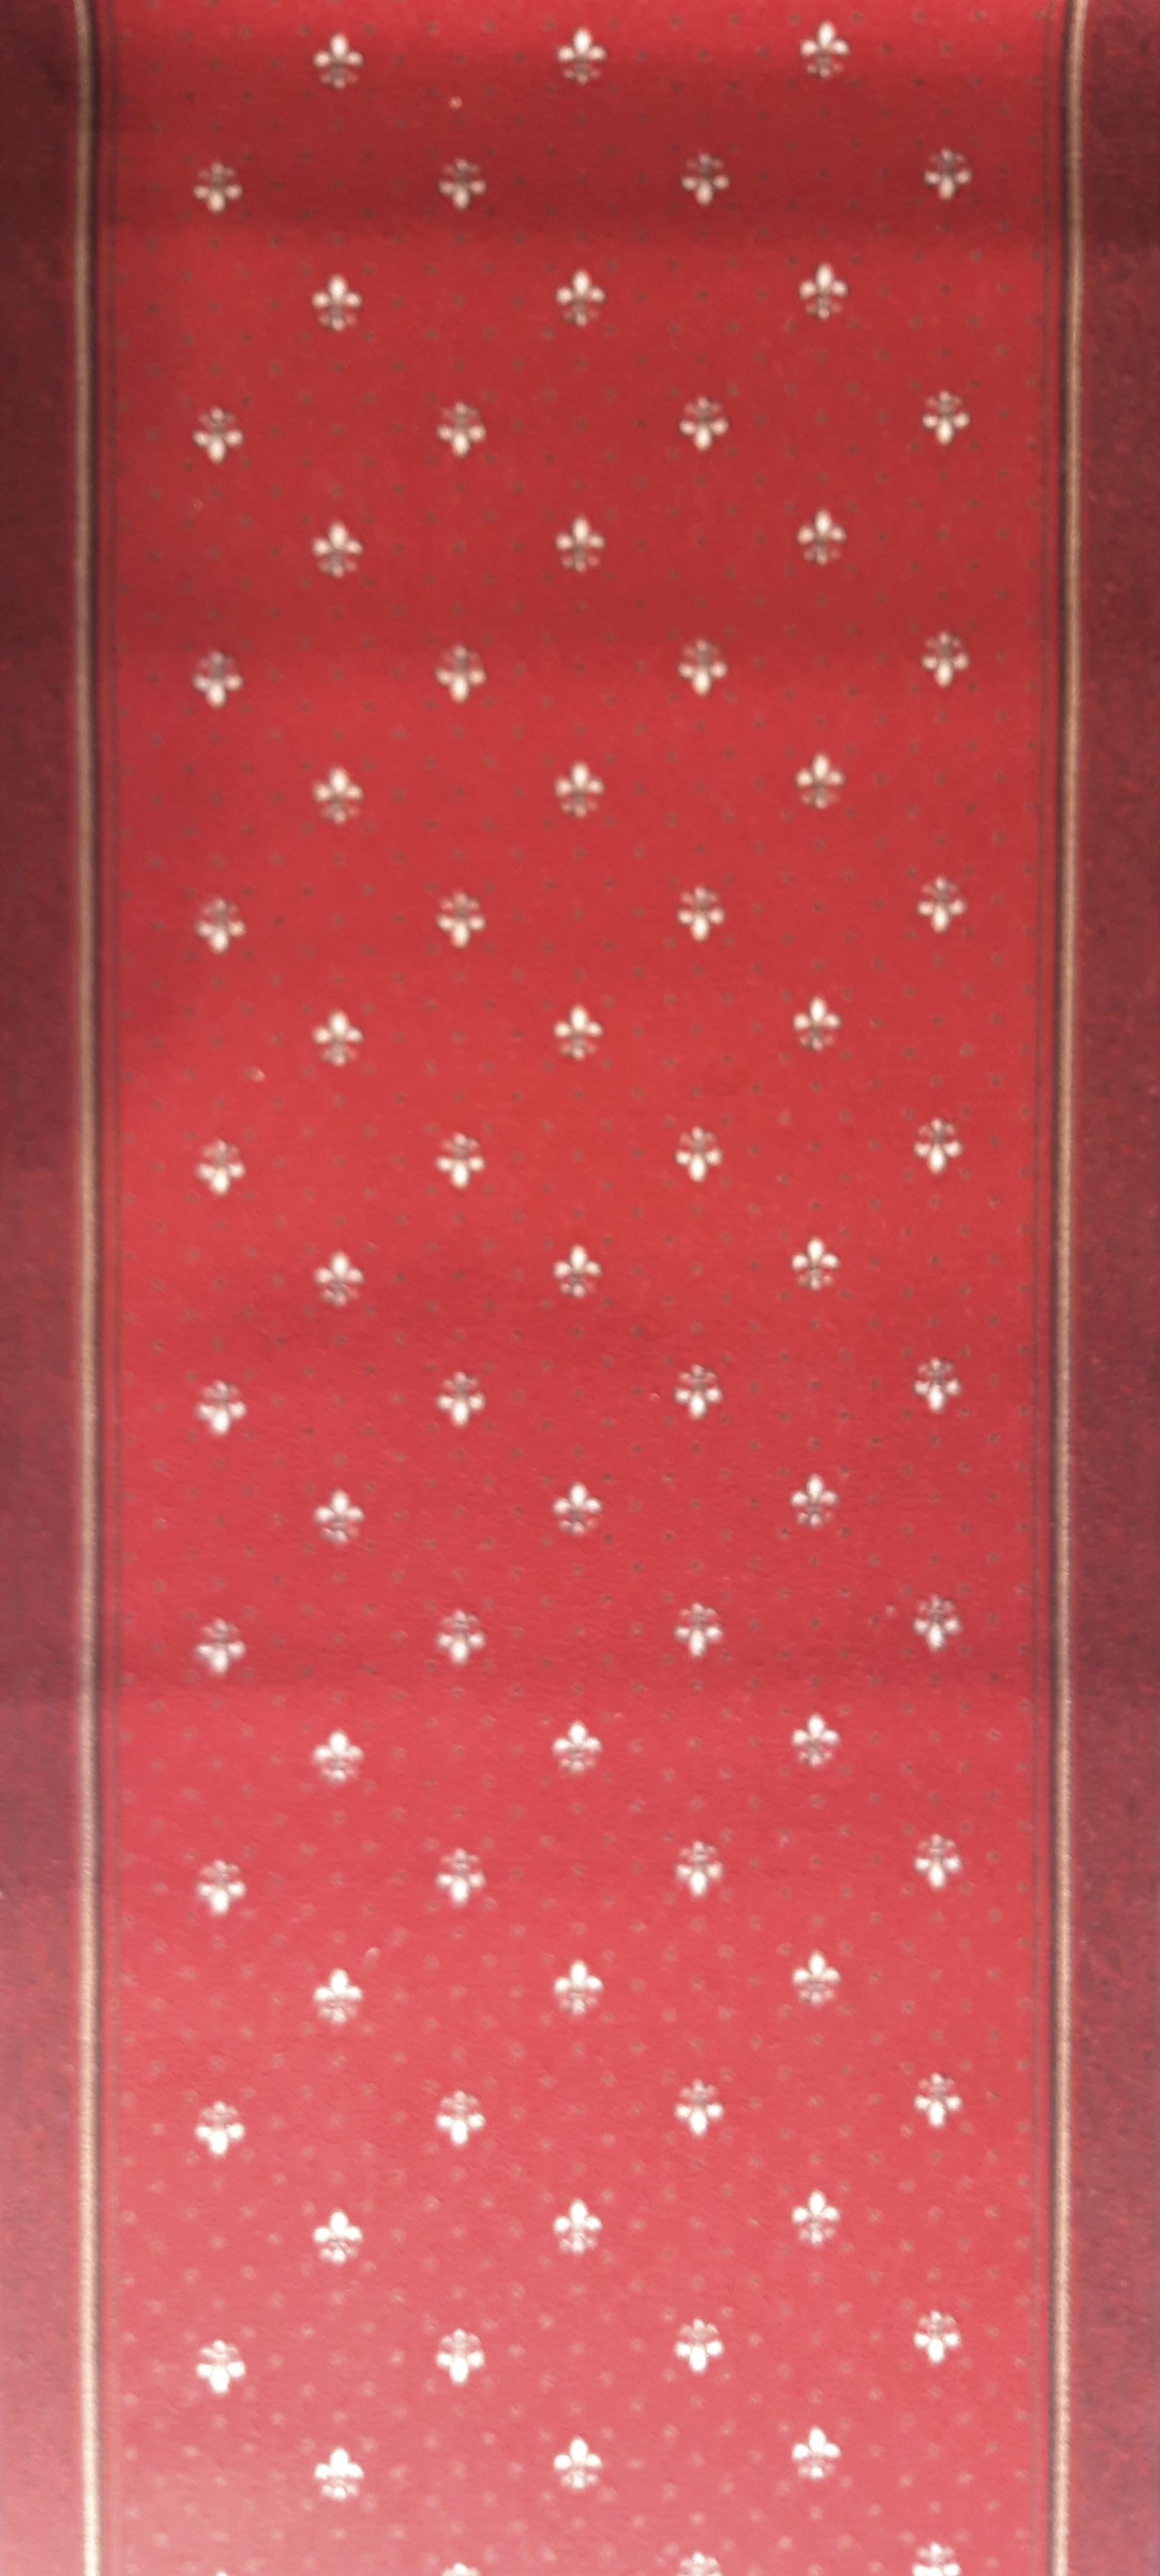 Traversa Tesatura Plata 1835, Rosu, 100x3000 cm, 820 gr/mp 1